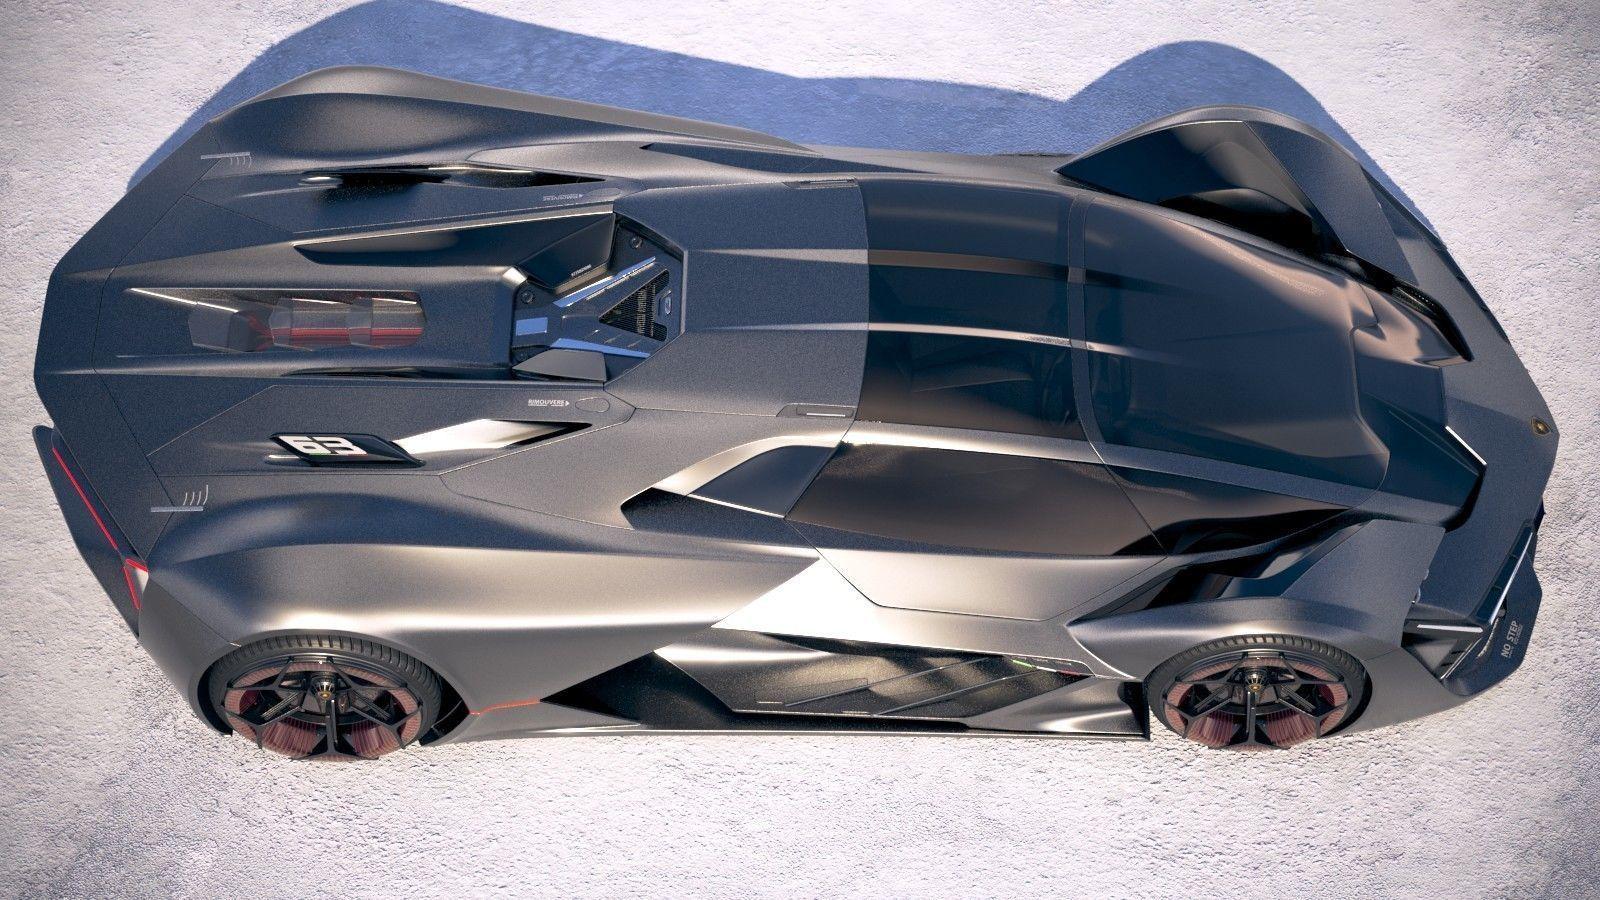 Lamborghini Terzo Millennio 2018 Model Max Obj Mtl S Fbx C4d Lwo Lw Lws 8